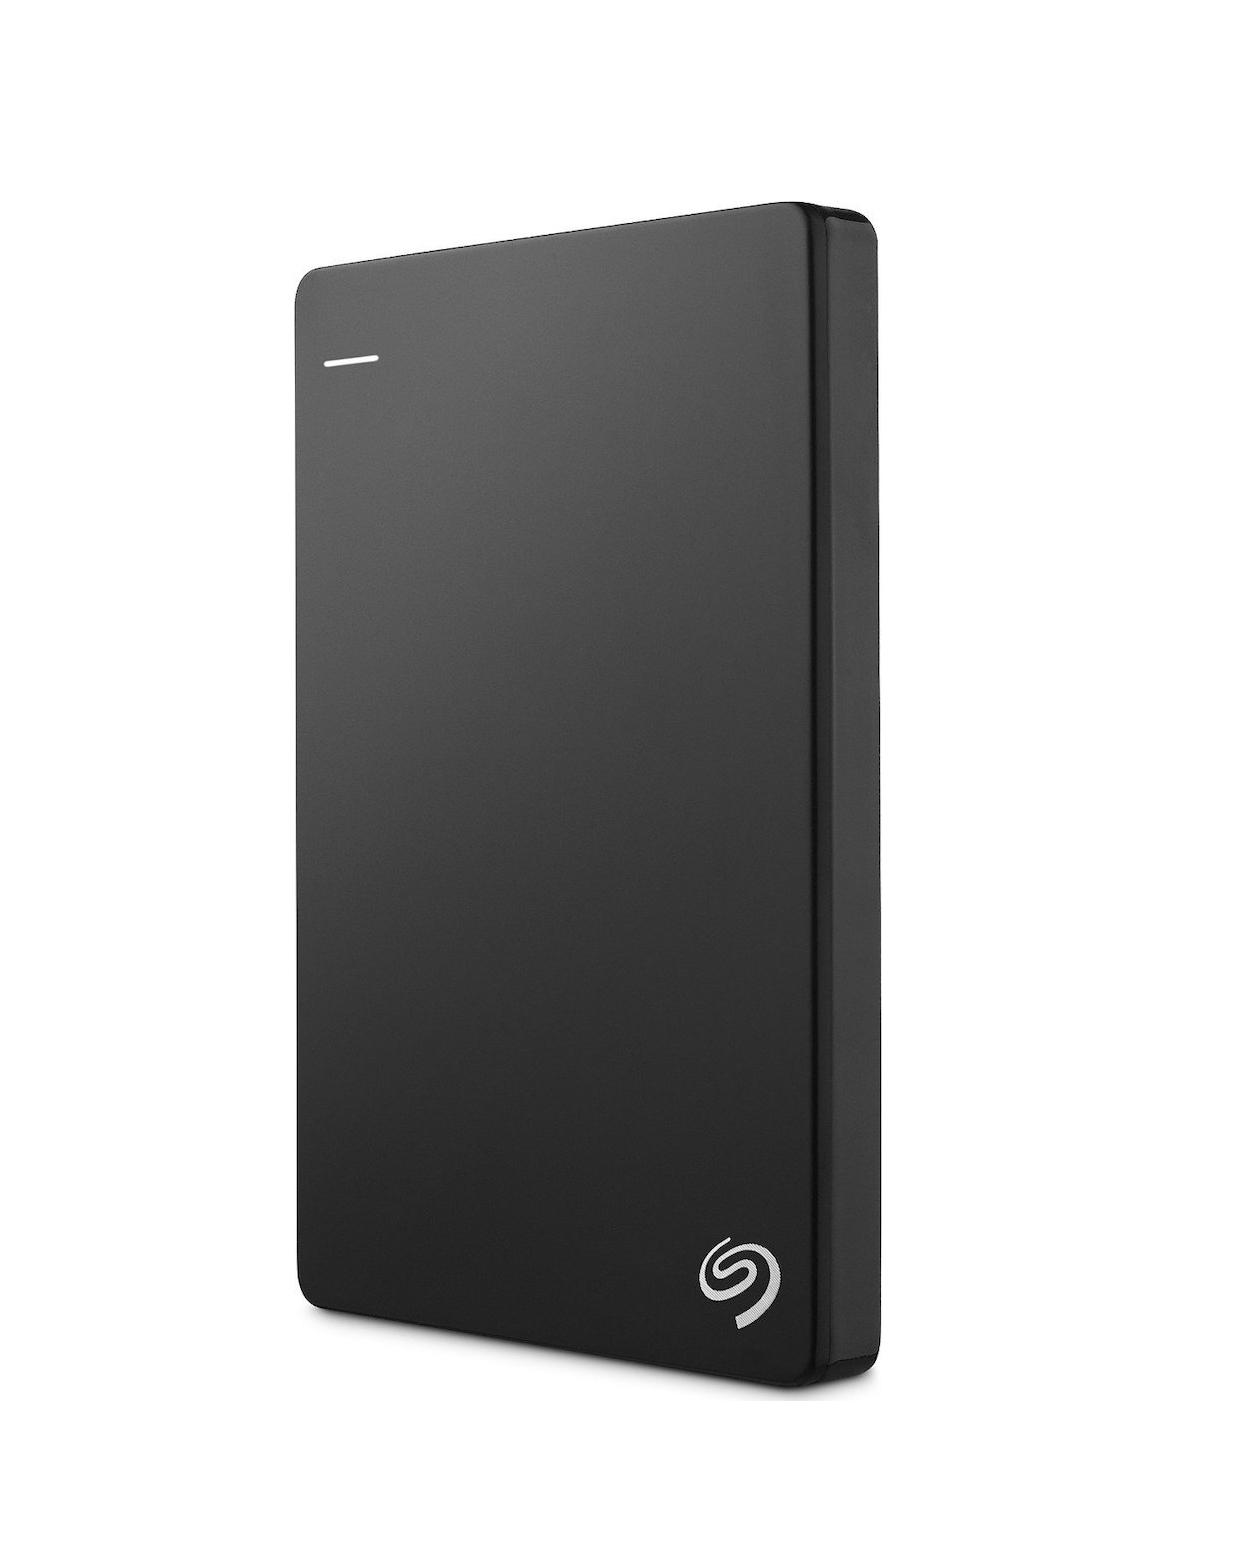 Seagate Backup Plus Slim 1TB Εξωτερικός Σκληρός Δίσκος Black